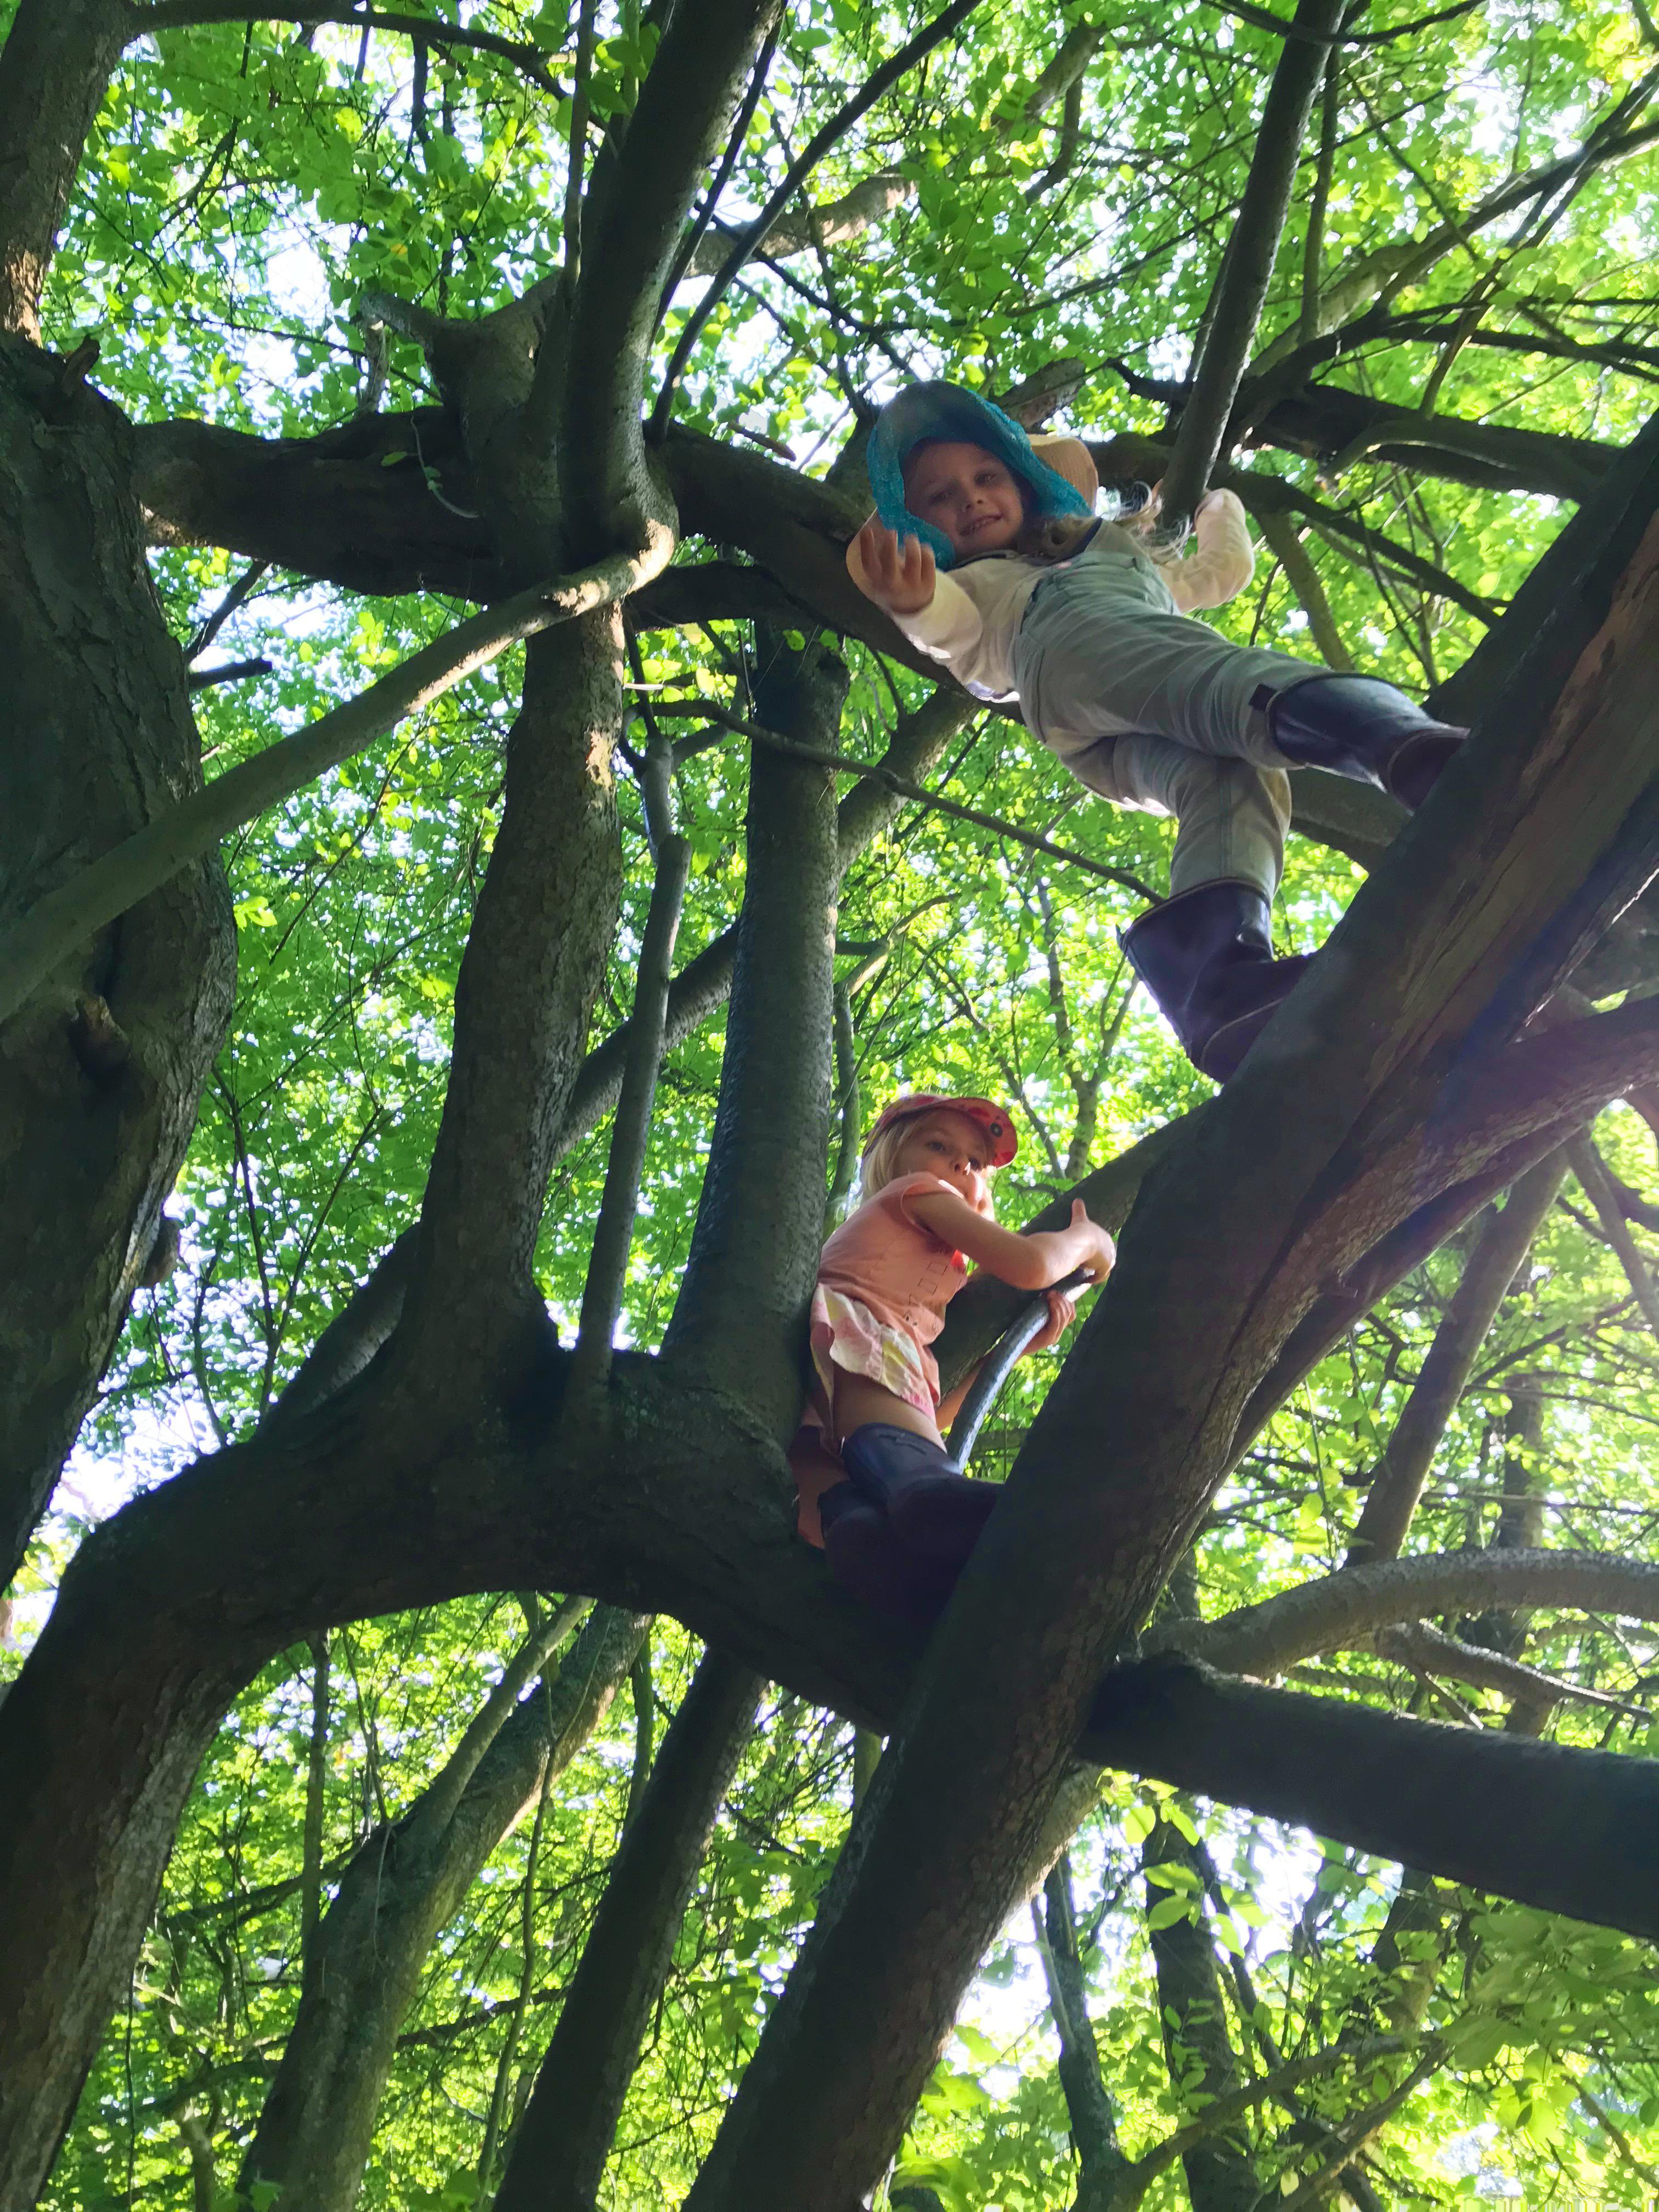 The children climb in the trees - Photo by Rikke Rosengren